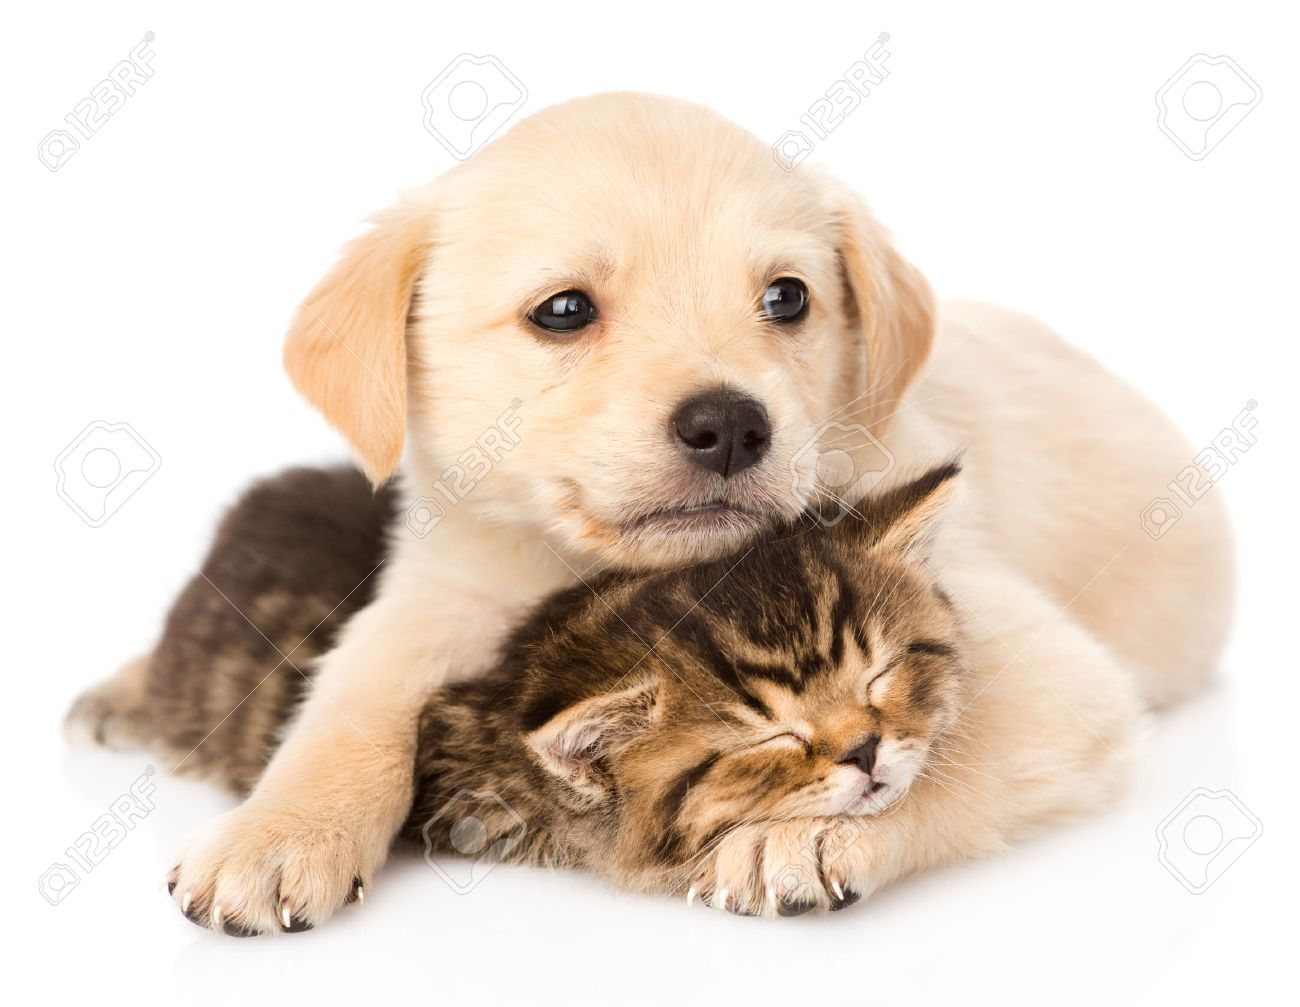 Golden Retriever Puppy Dog Hugging Sleeping British Cat Isolated